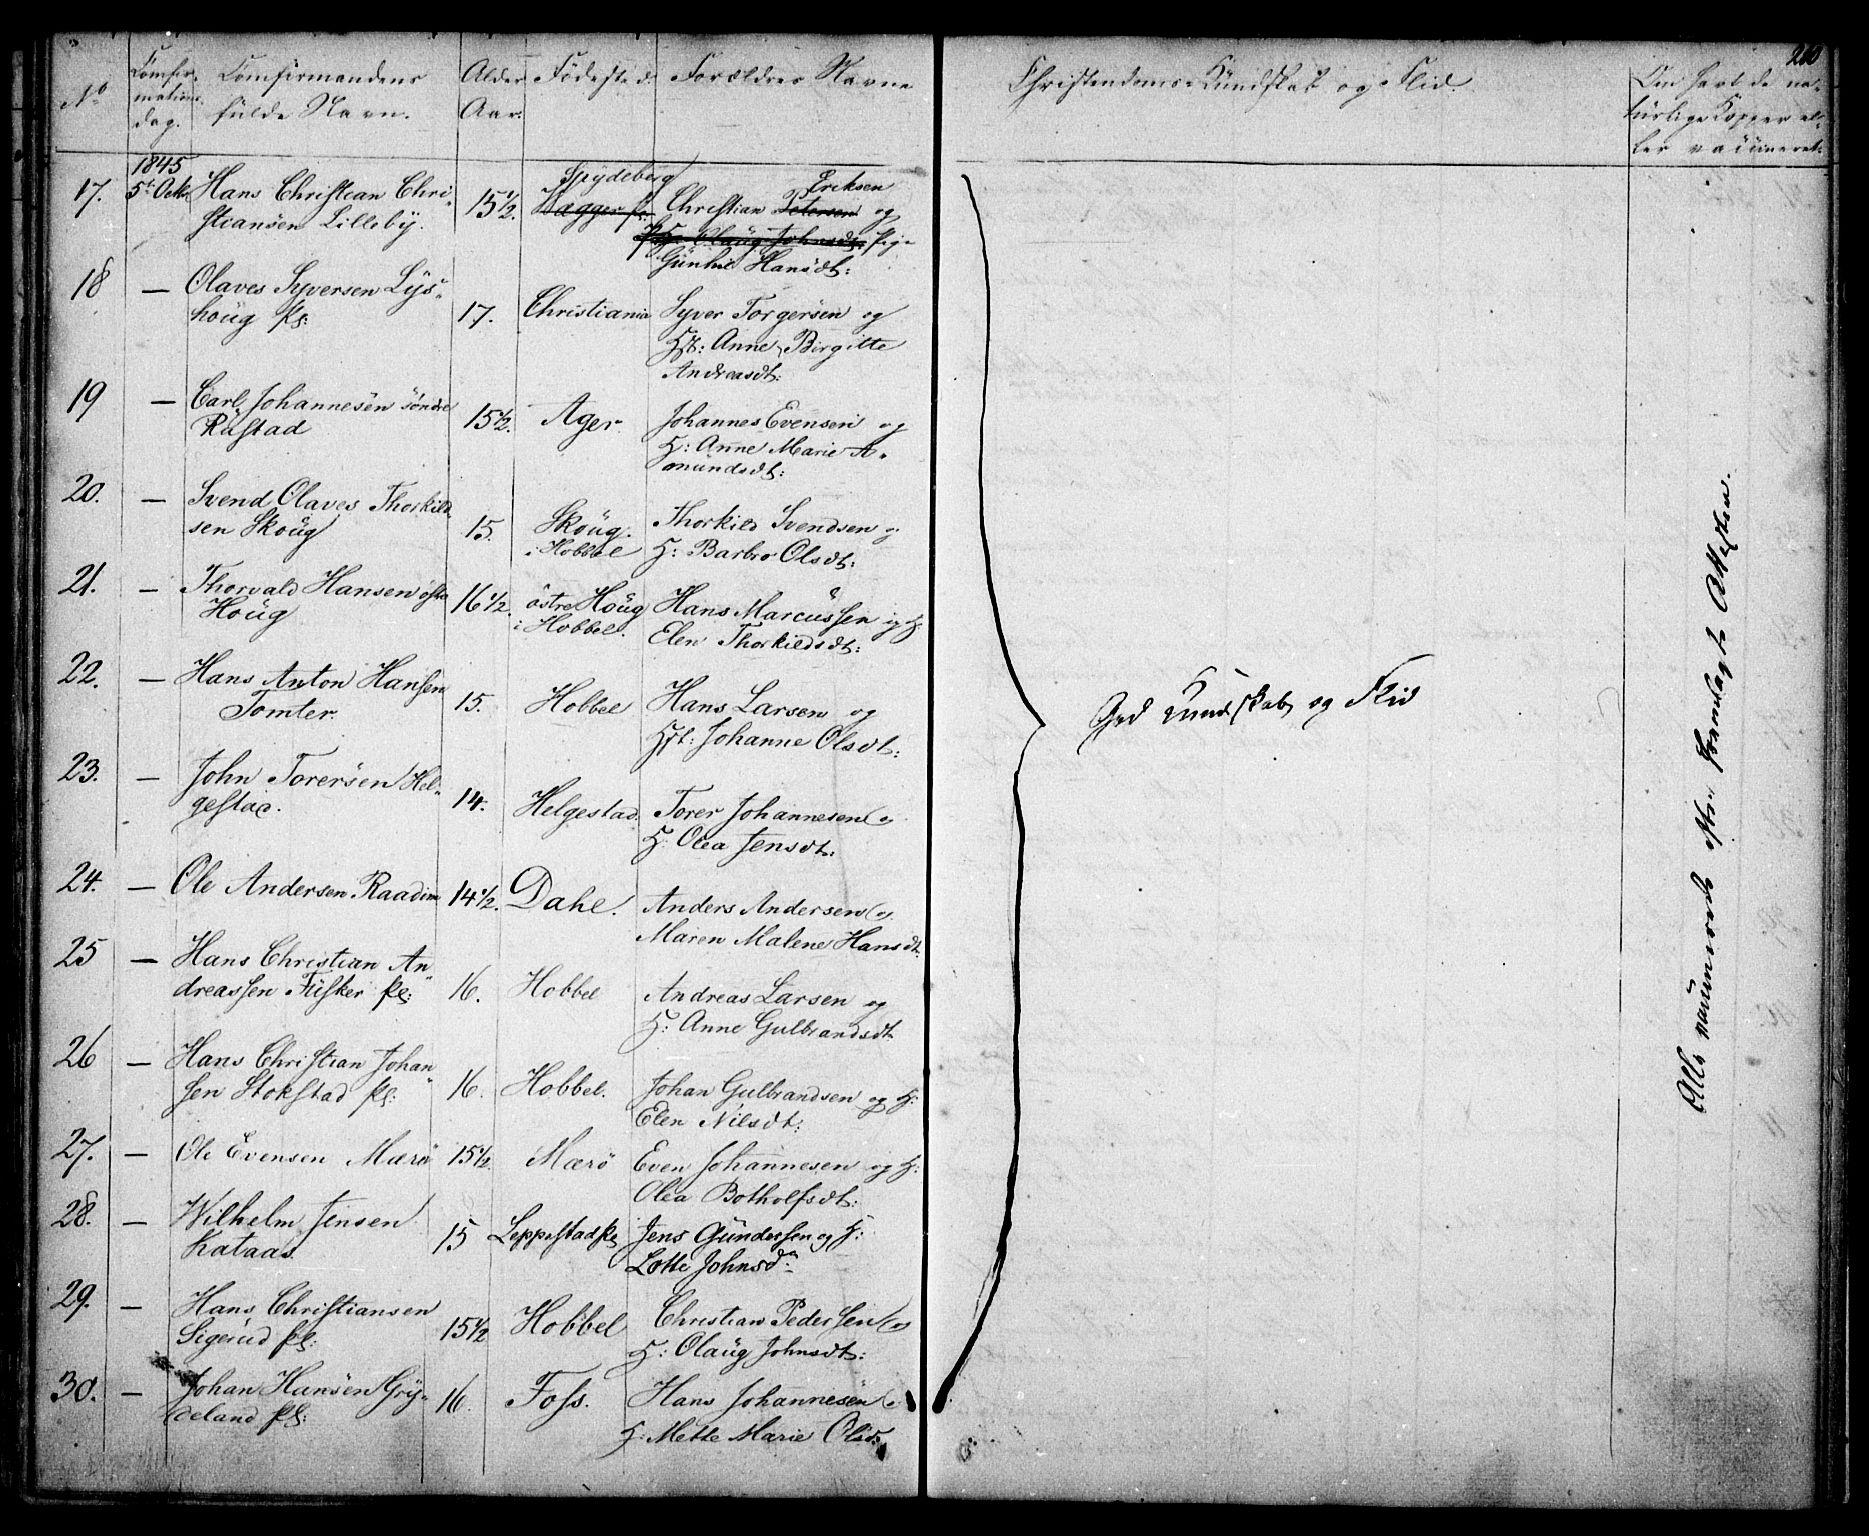 SAO, Kråkstad prestekontor Kirkebøker, F/Fa/L0005: Ministerialbok nr. I 5, 1837-1847, s. 210